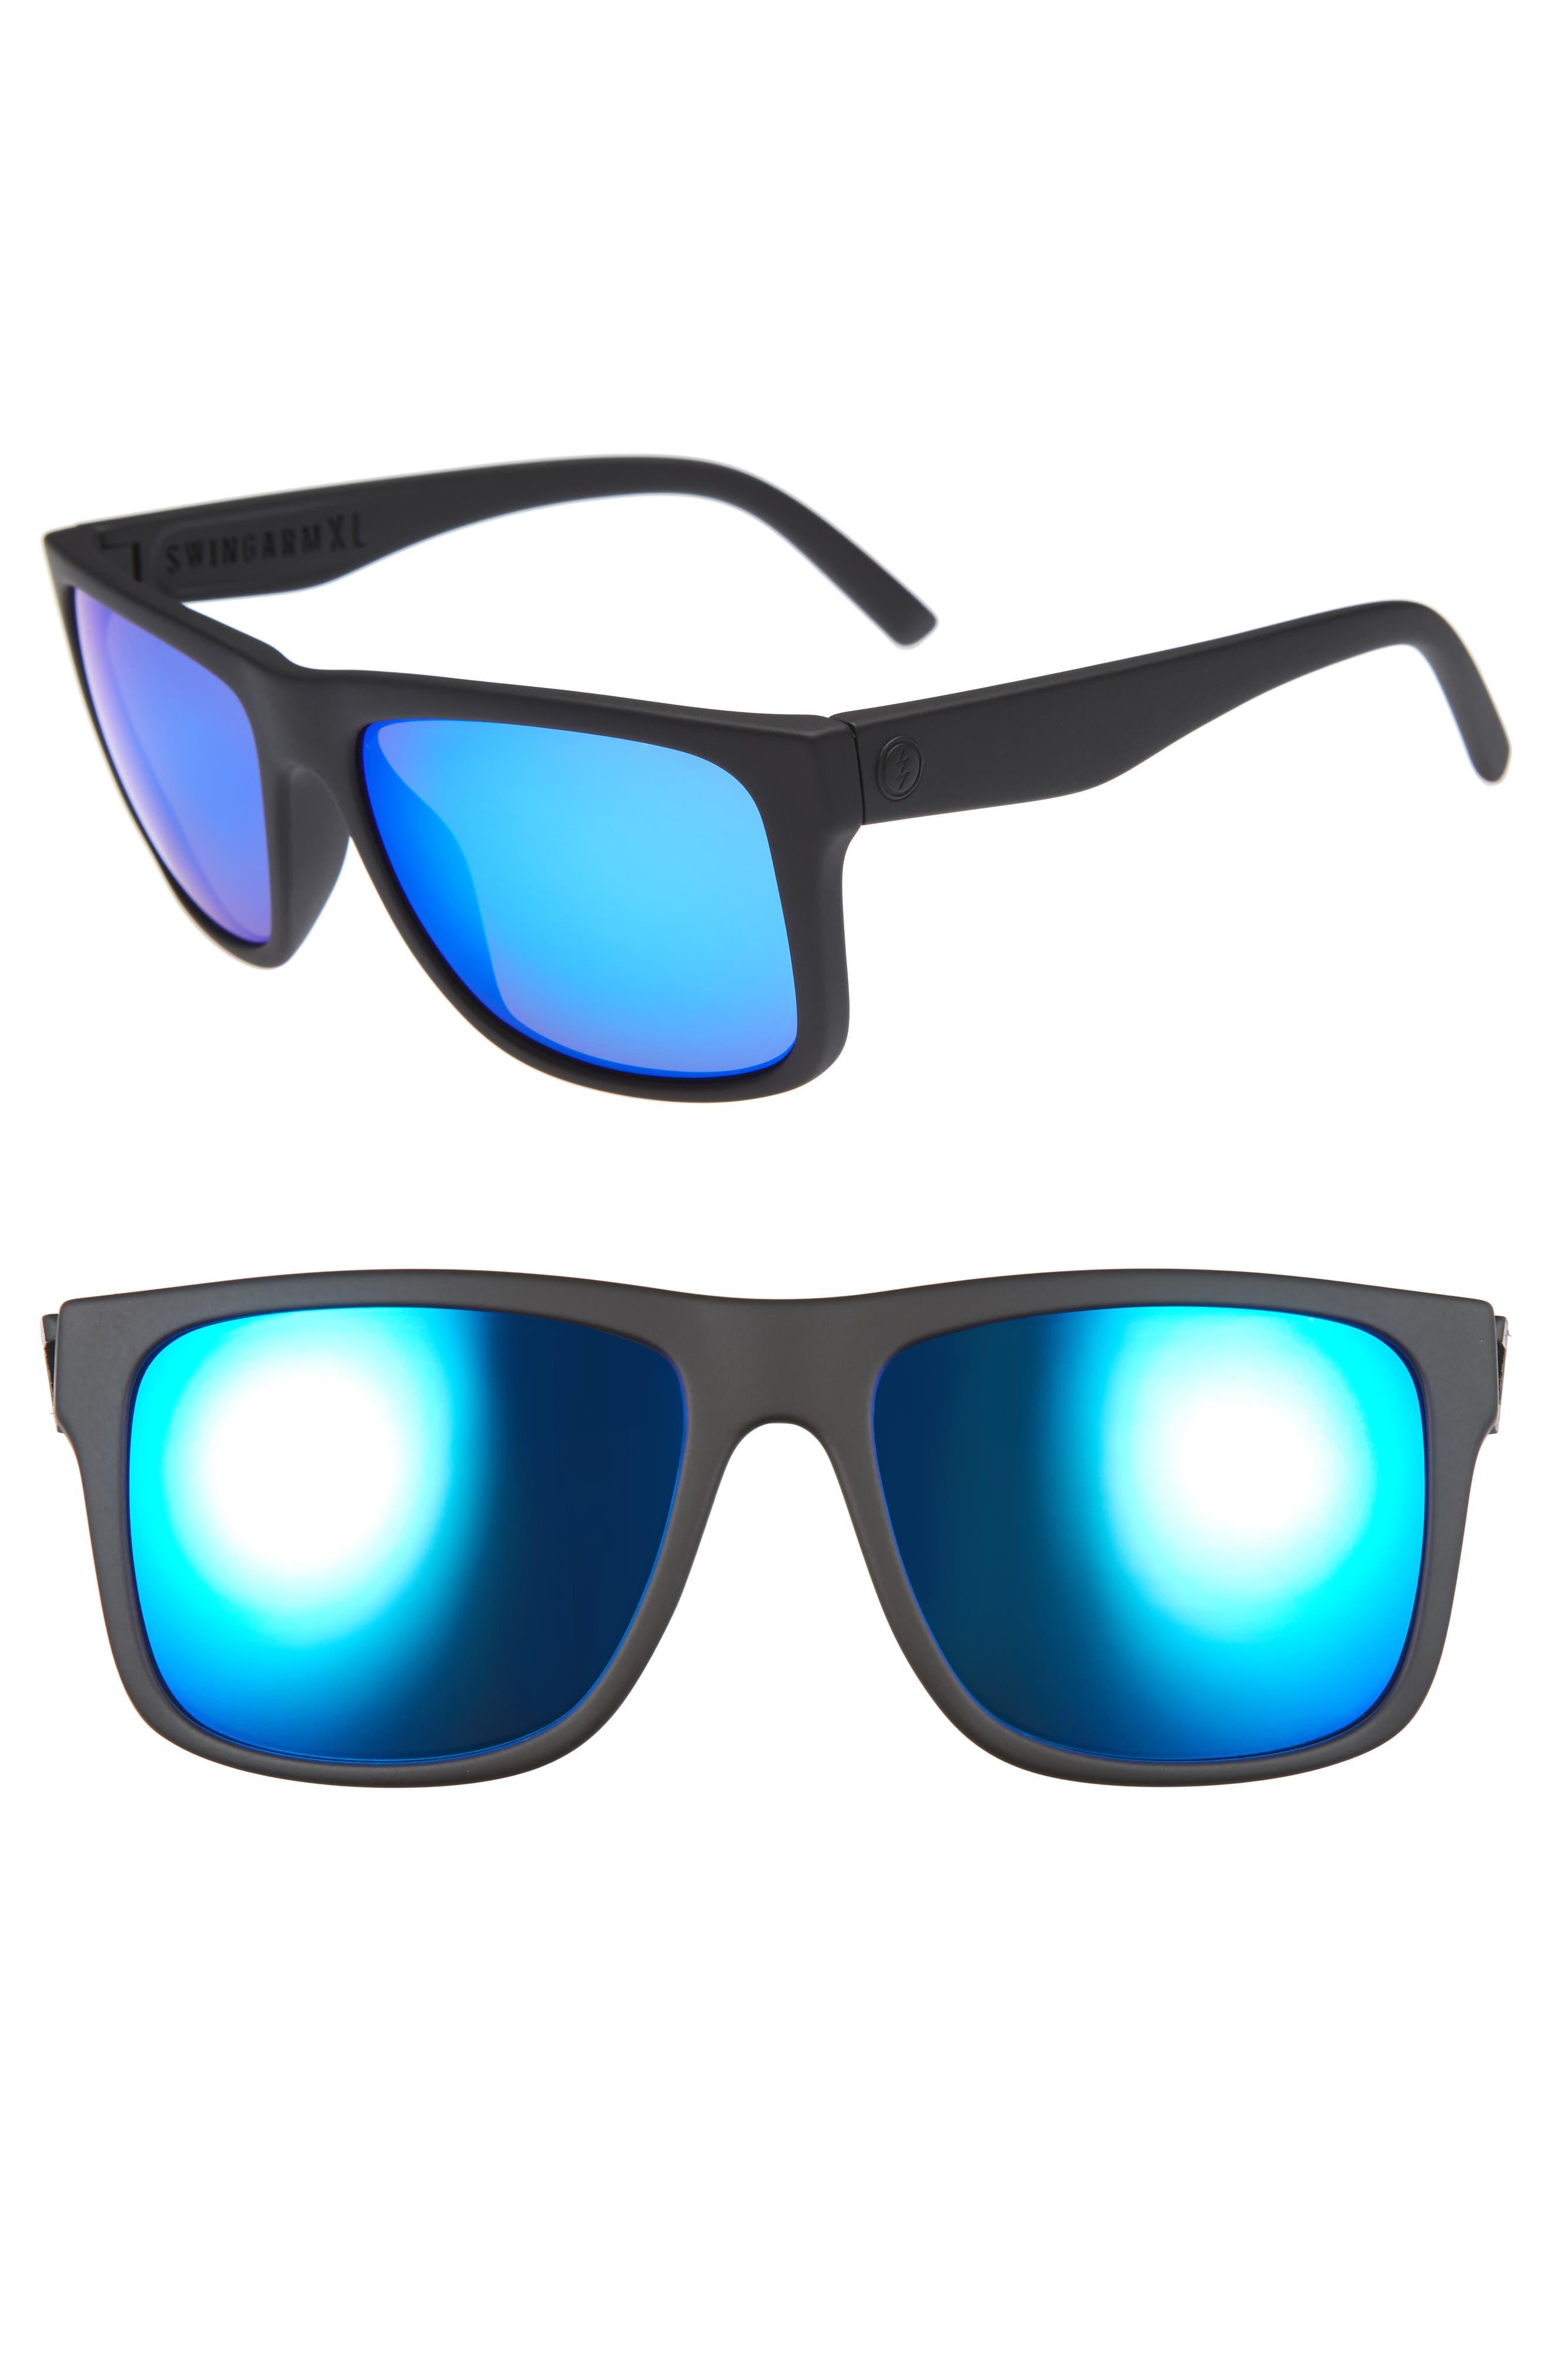 Alternate Image 1 Selected - ELECTRIC Swingarm XL 59mm Sunglasses